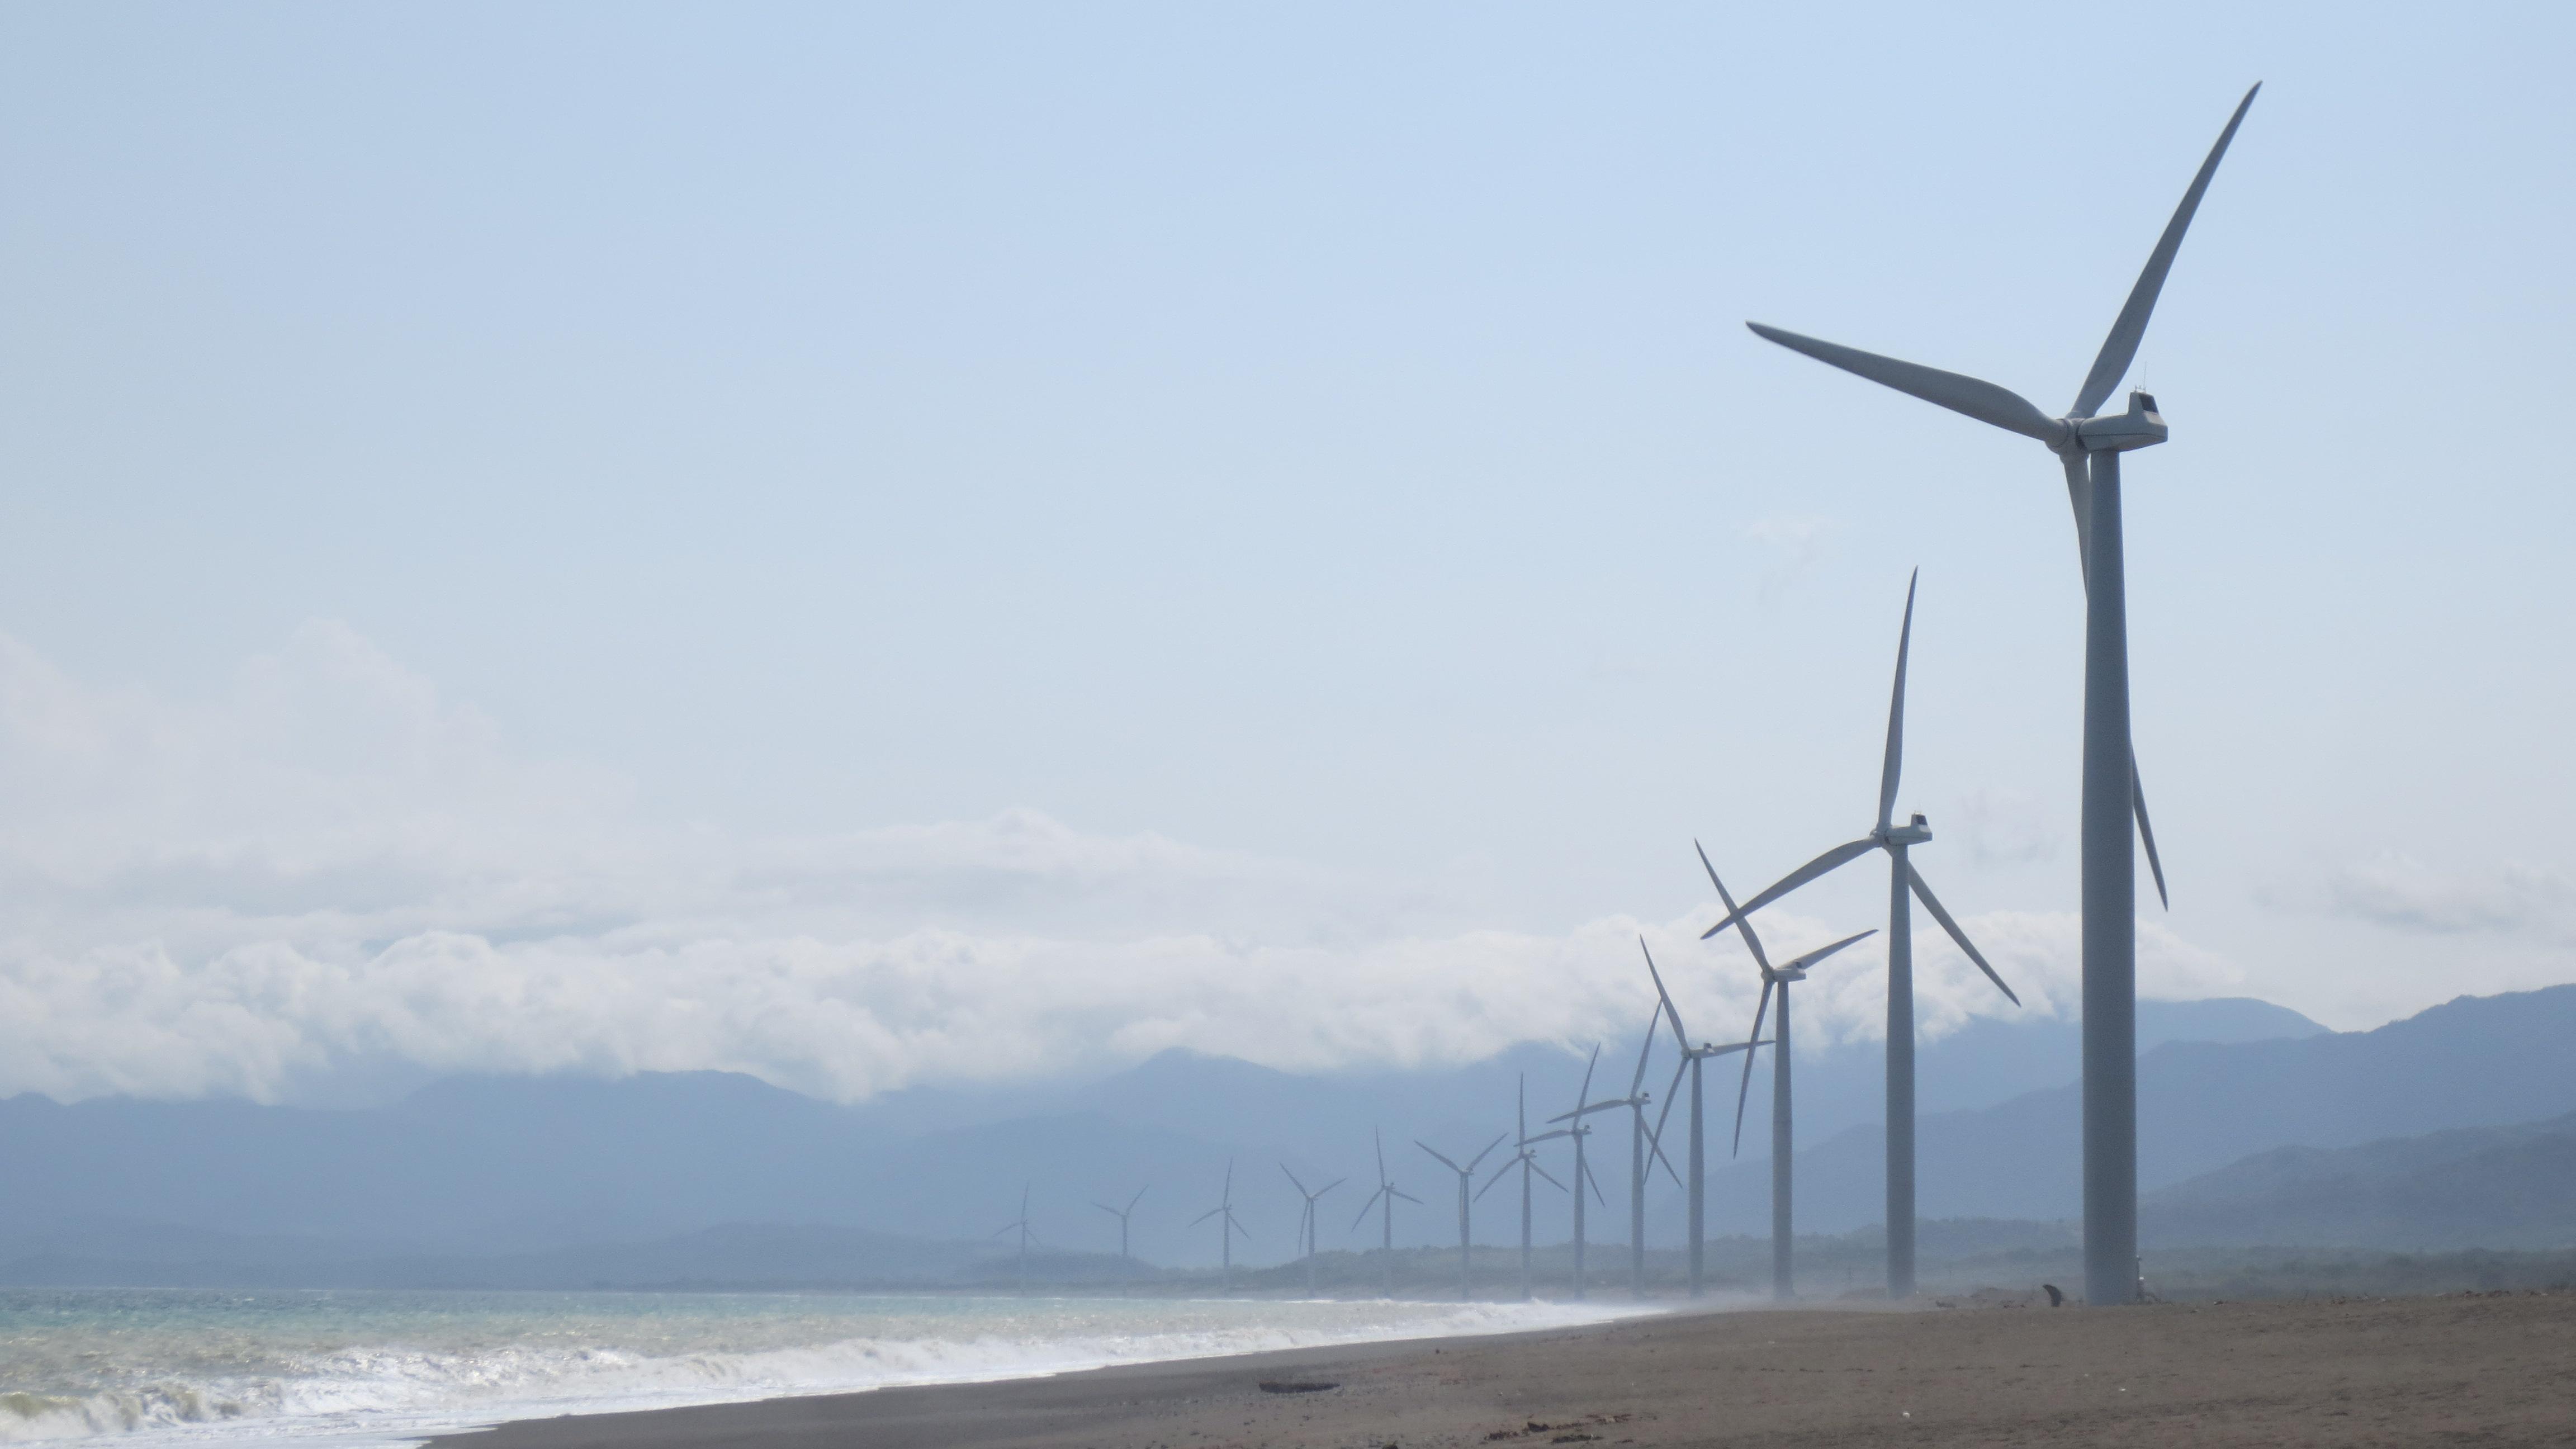 Ilocos Region - Wikipedia